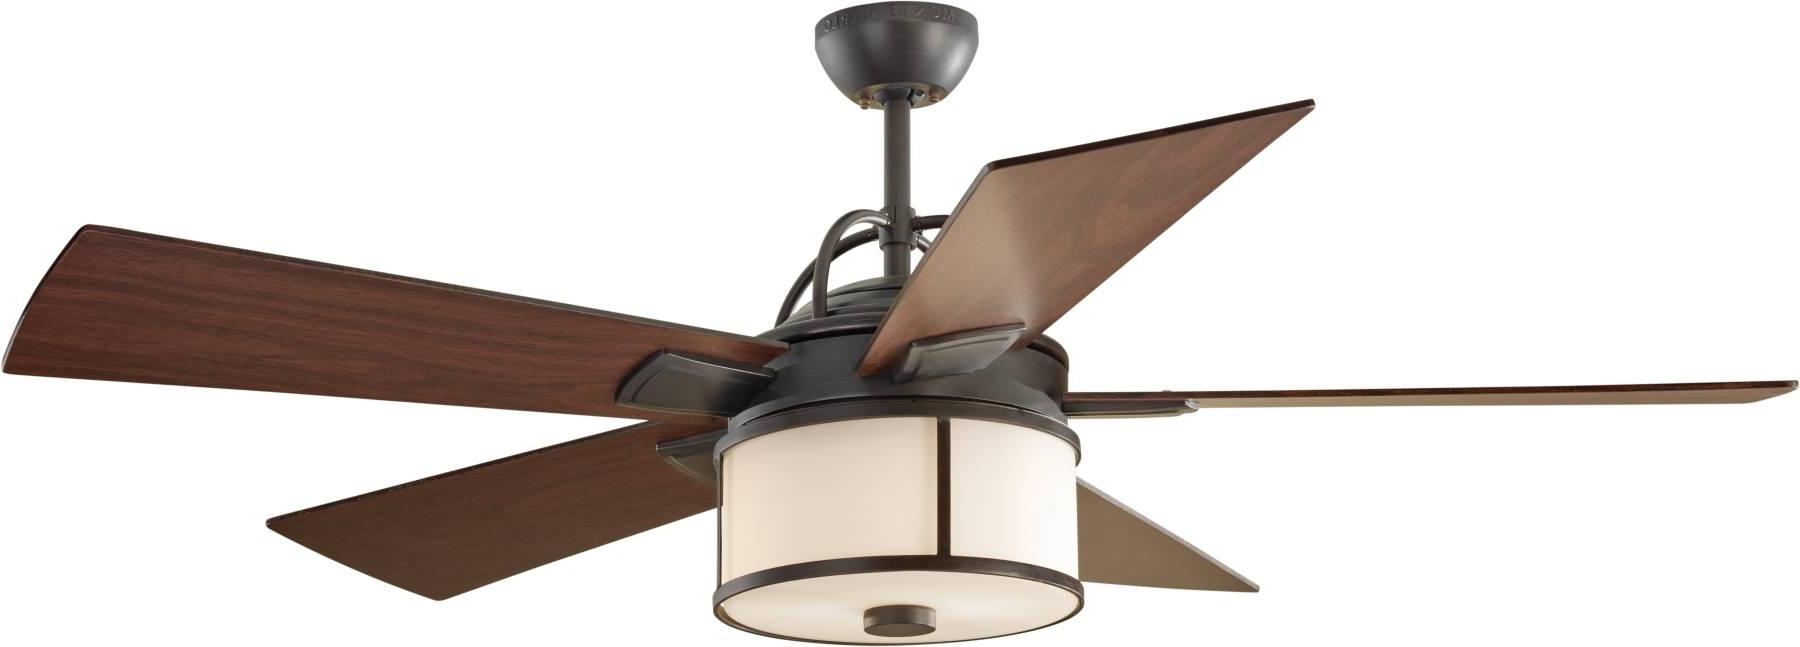 Victorian Style Outdoor Ceiling Fans Regarding Popular Monte Carlo Ceiling Fan Light Kit Beautiful Ceiling Light Fixture (View 19 of 20)